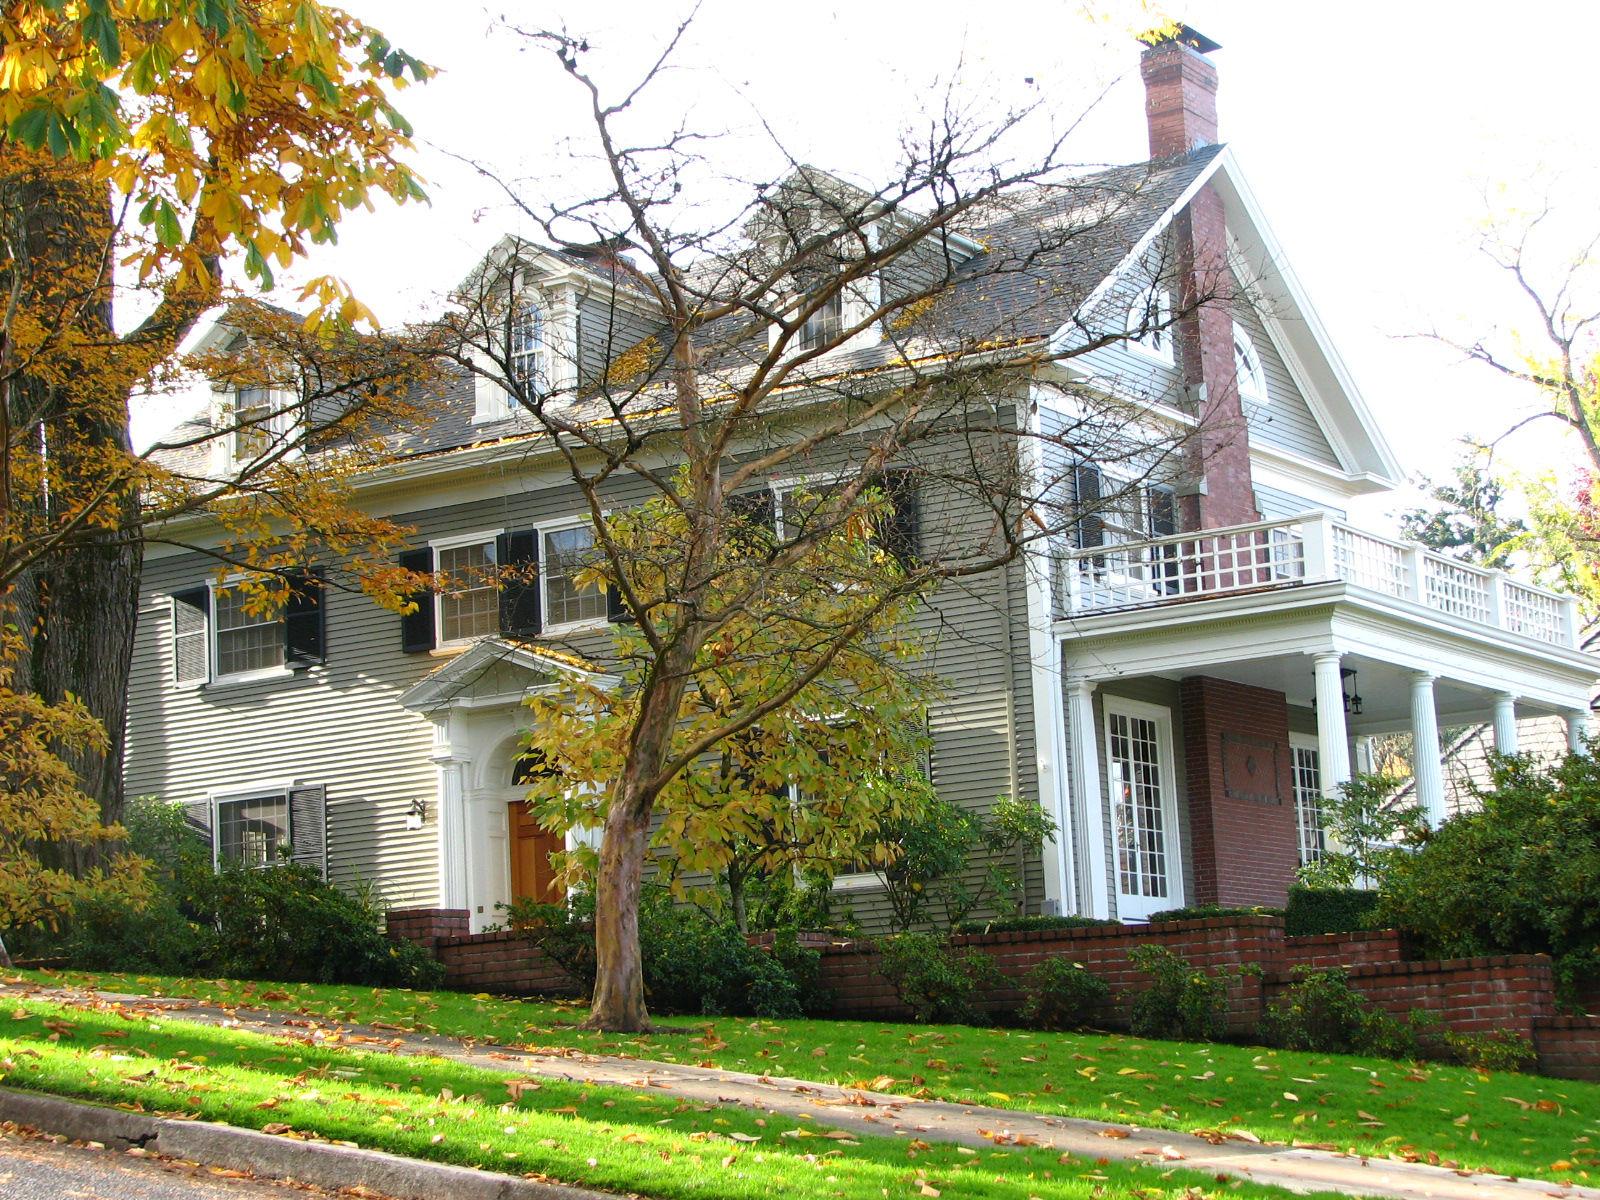 Portland's historic James Wheeler House in the affluent Homestead neighborhood